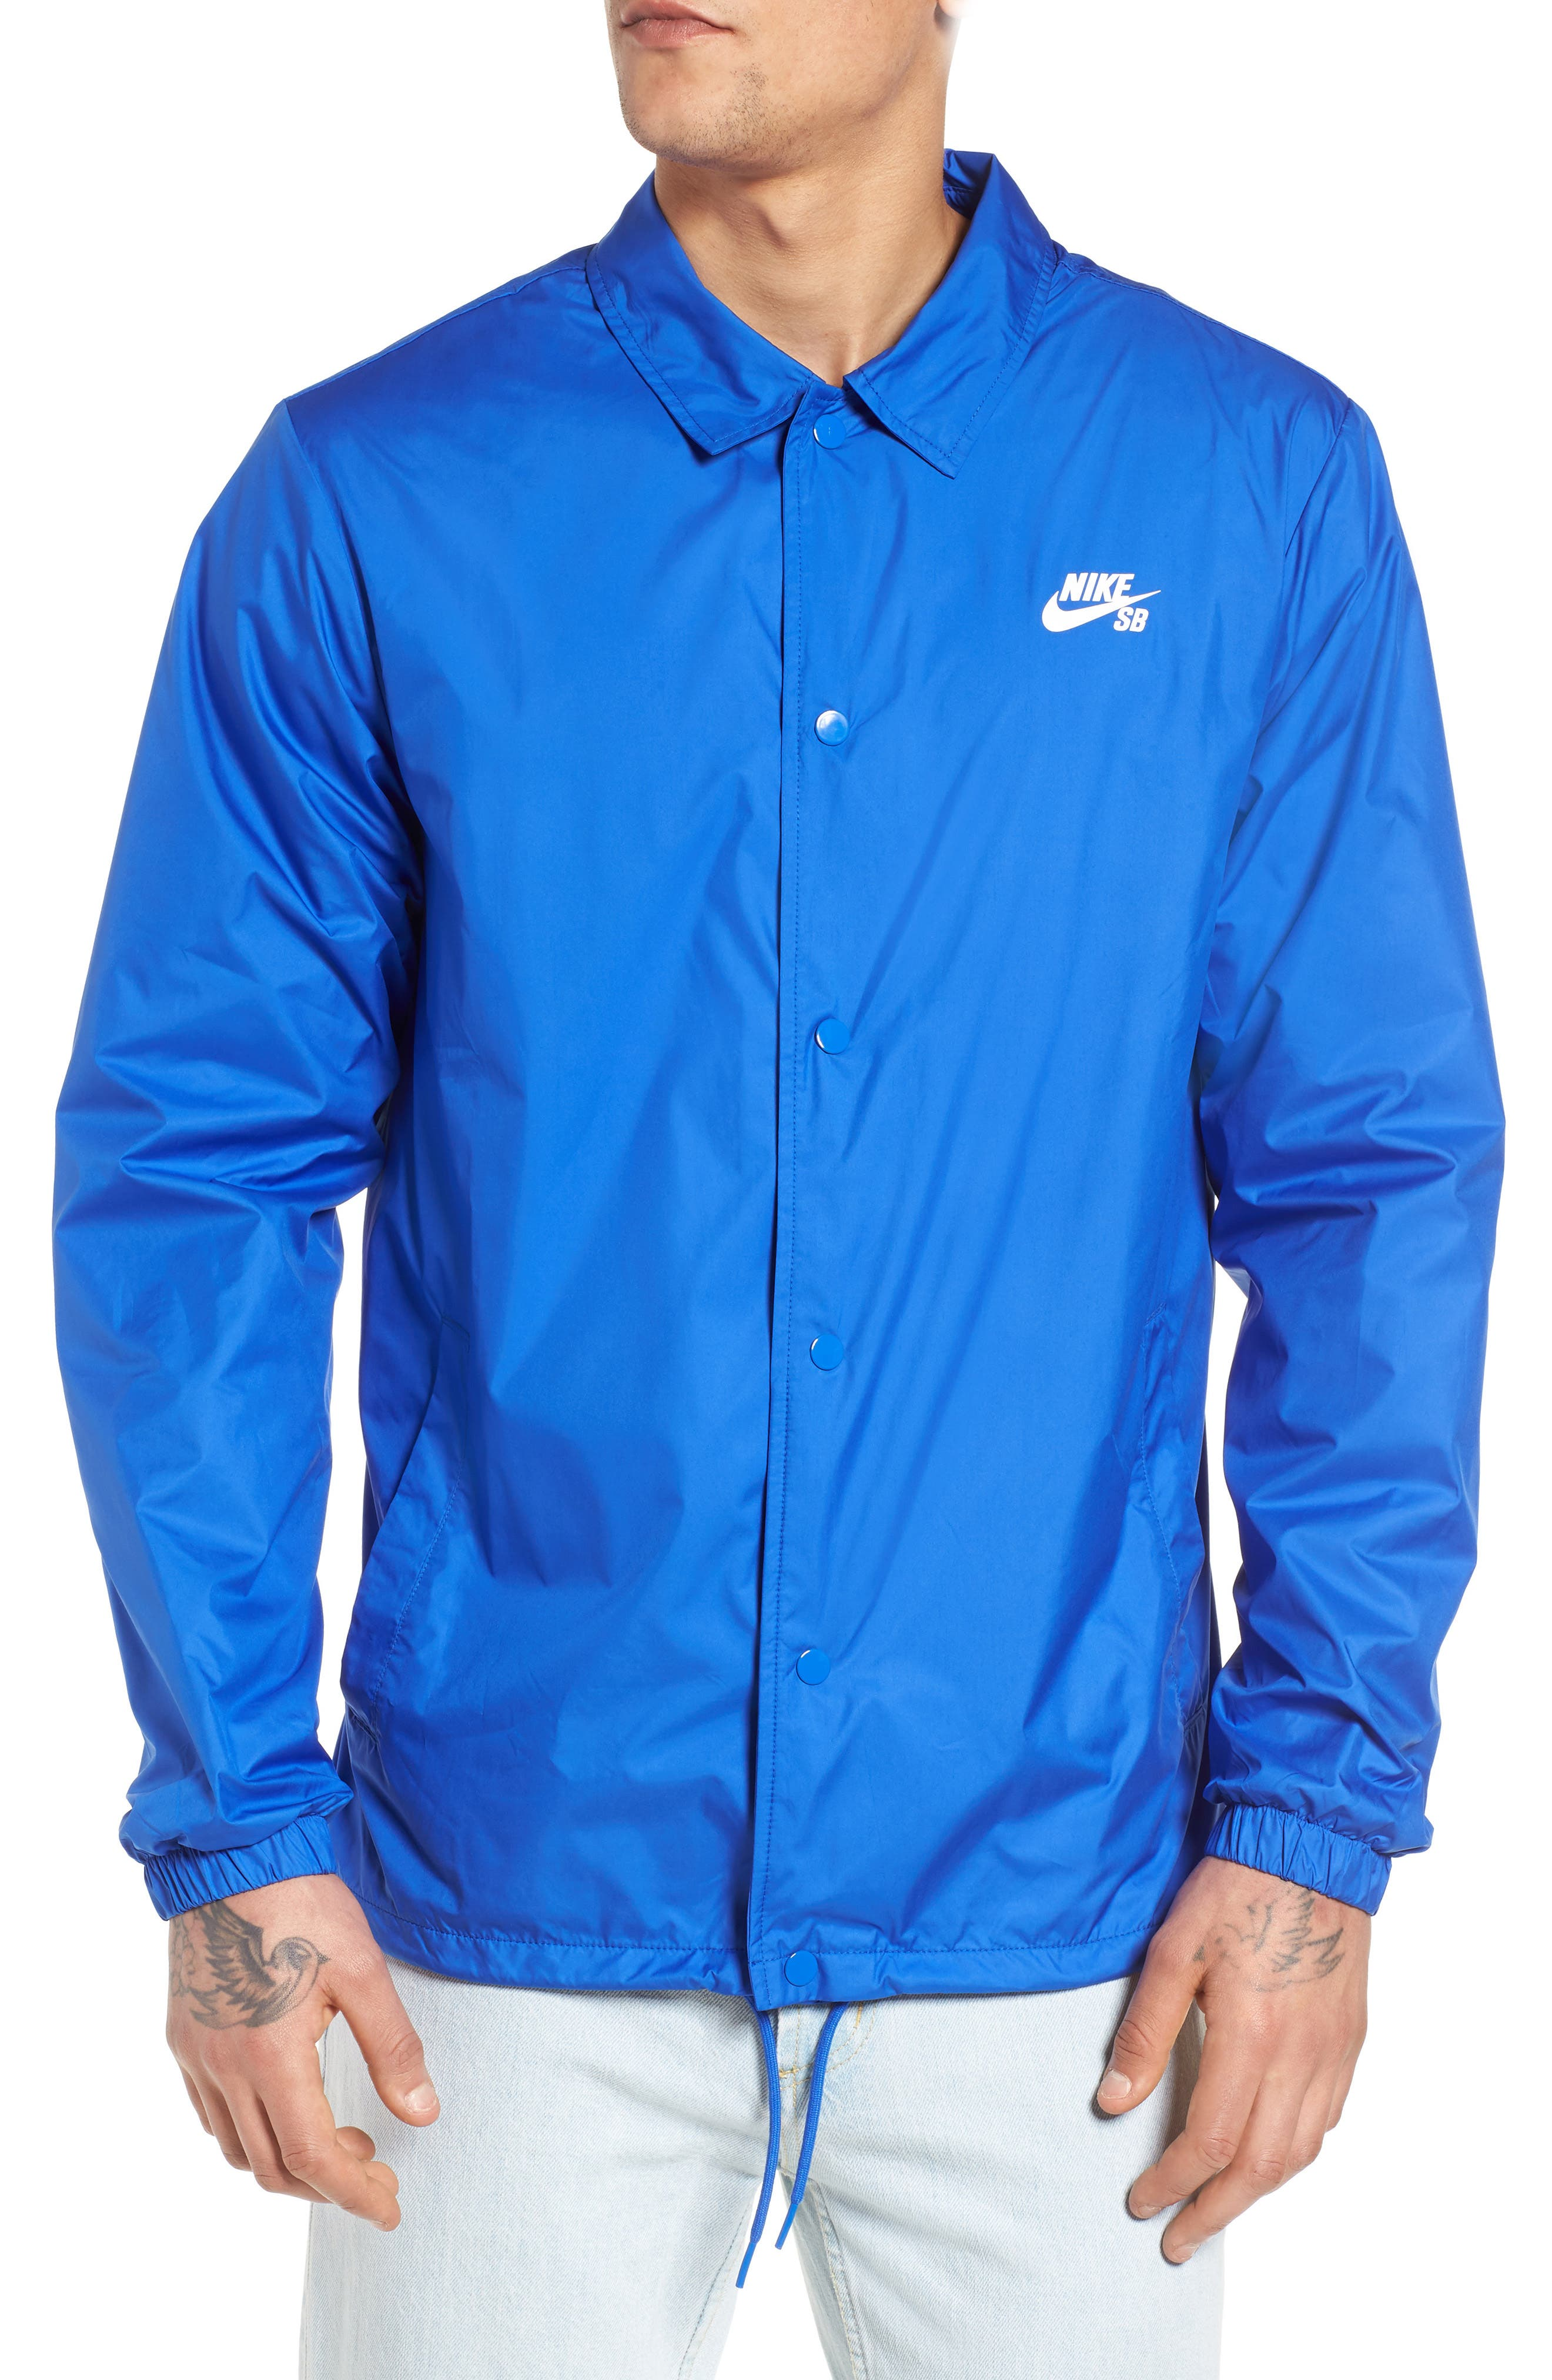 SB Shield Coach's Jacket,                             Alternate thumbnail 4, color,                             HYPER ROYAL/ WHITE